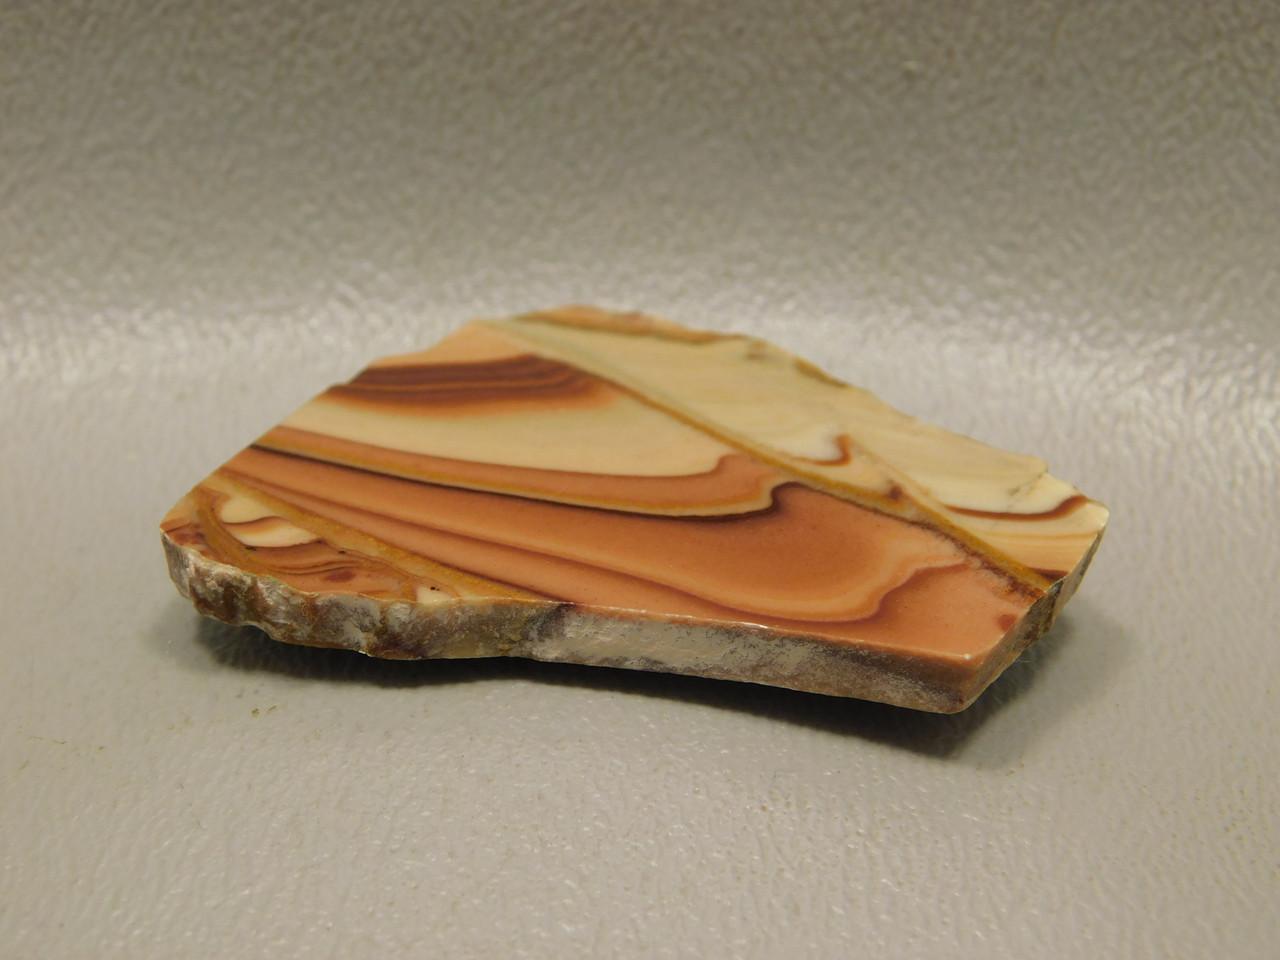 Wave Dolomite Cabochon Semiprecious Stone Slab #S7